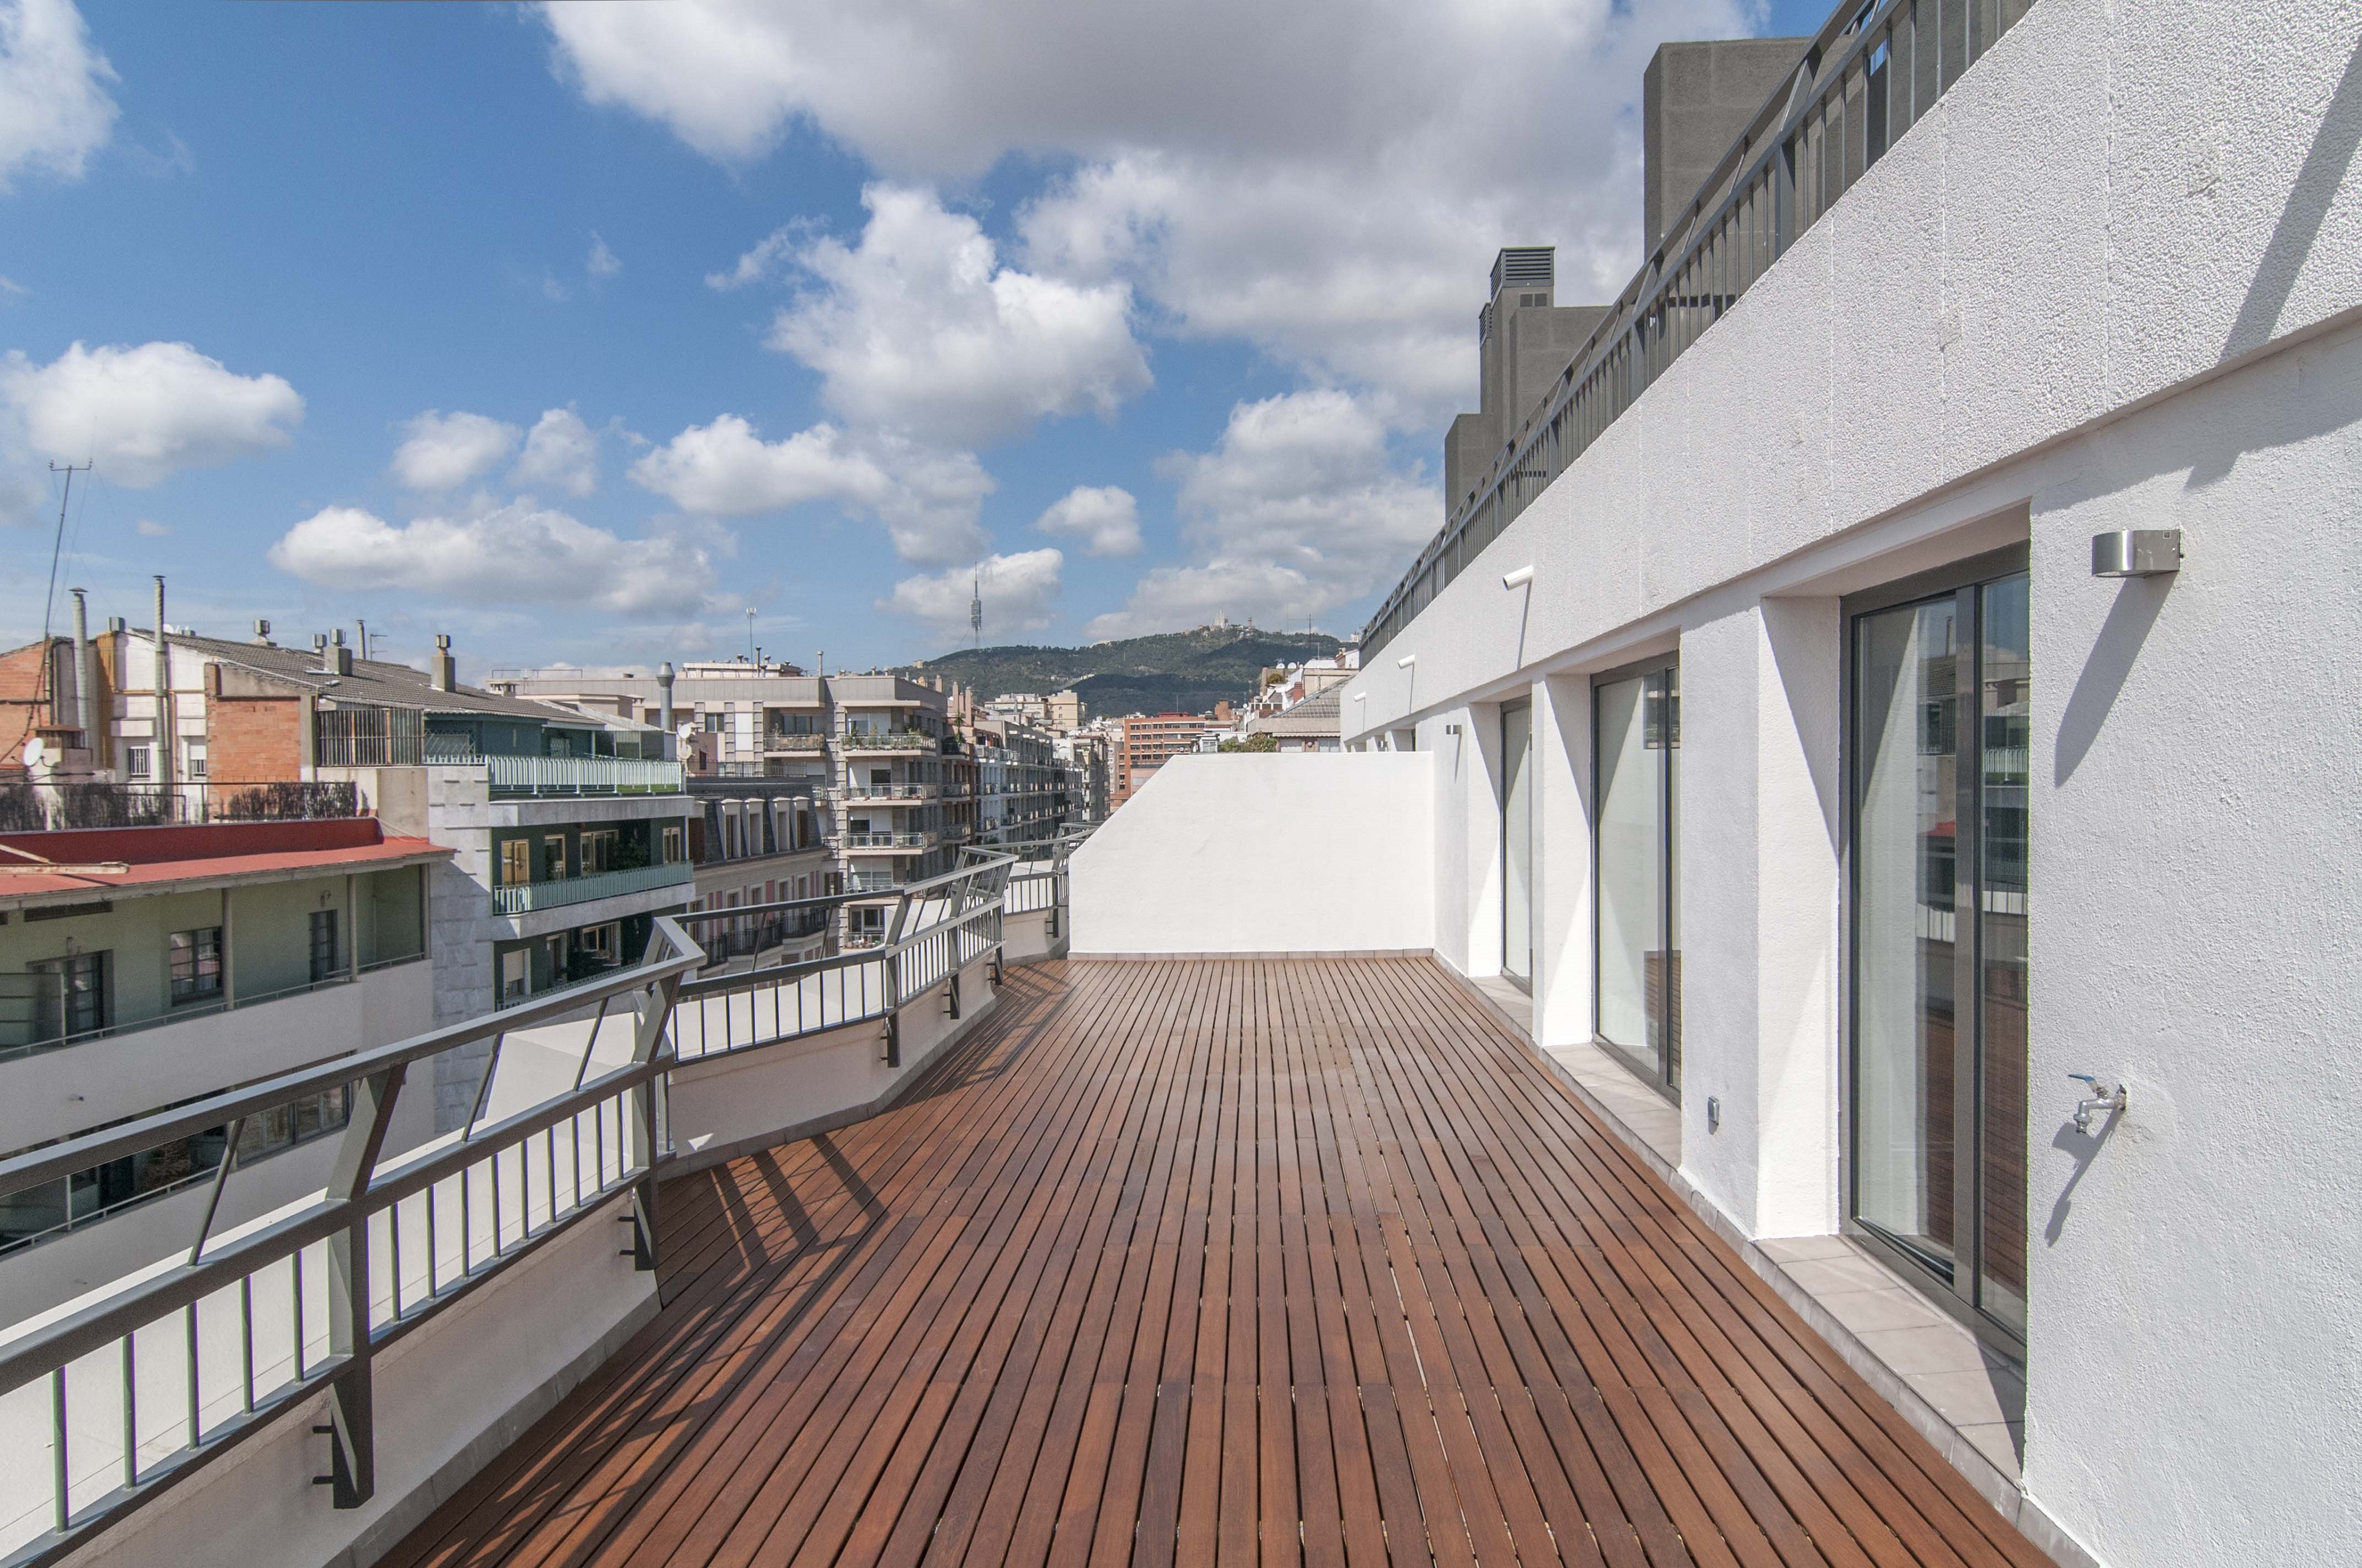 Appartement pour l Vente à Newly fabricated Loft-flat with terrace Zona Alta, Barcelona City, Barcelona 08034 Espagne